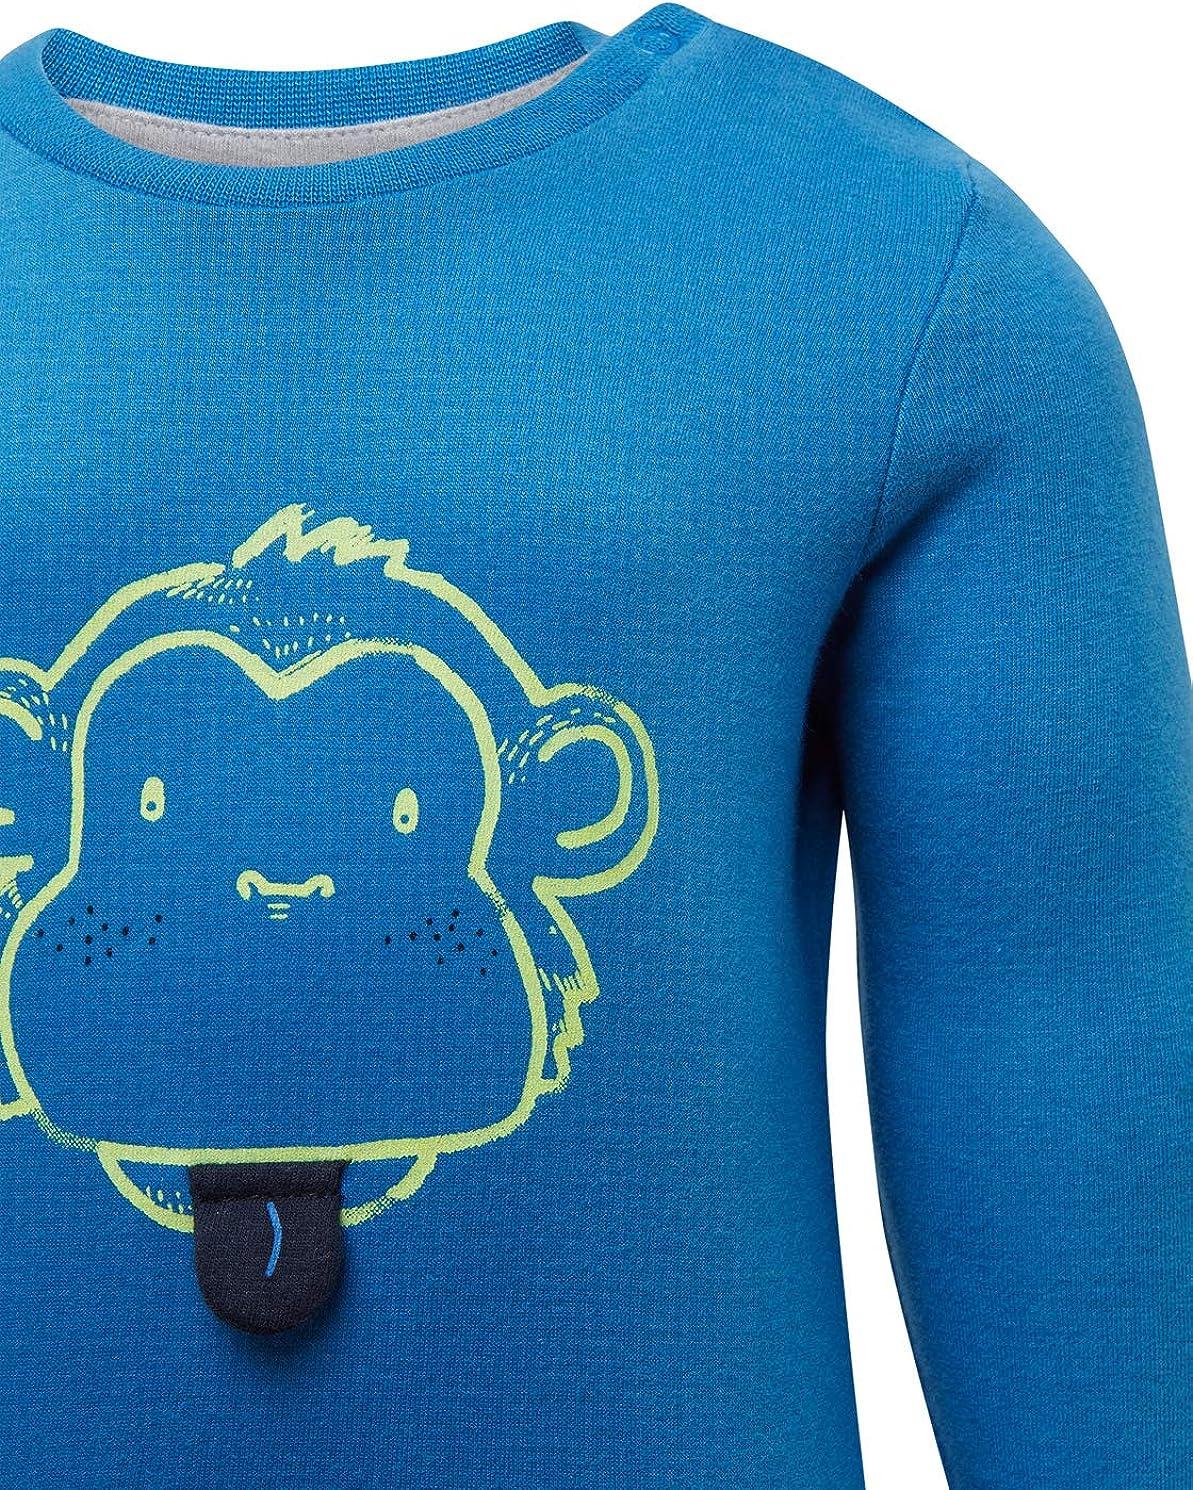 TOM TAILOR Baby-Jungen Placed Print T-Shirt